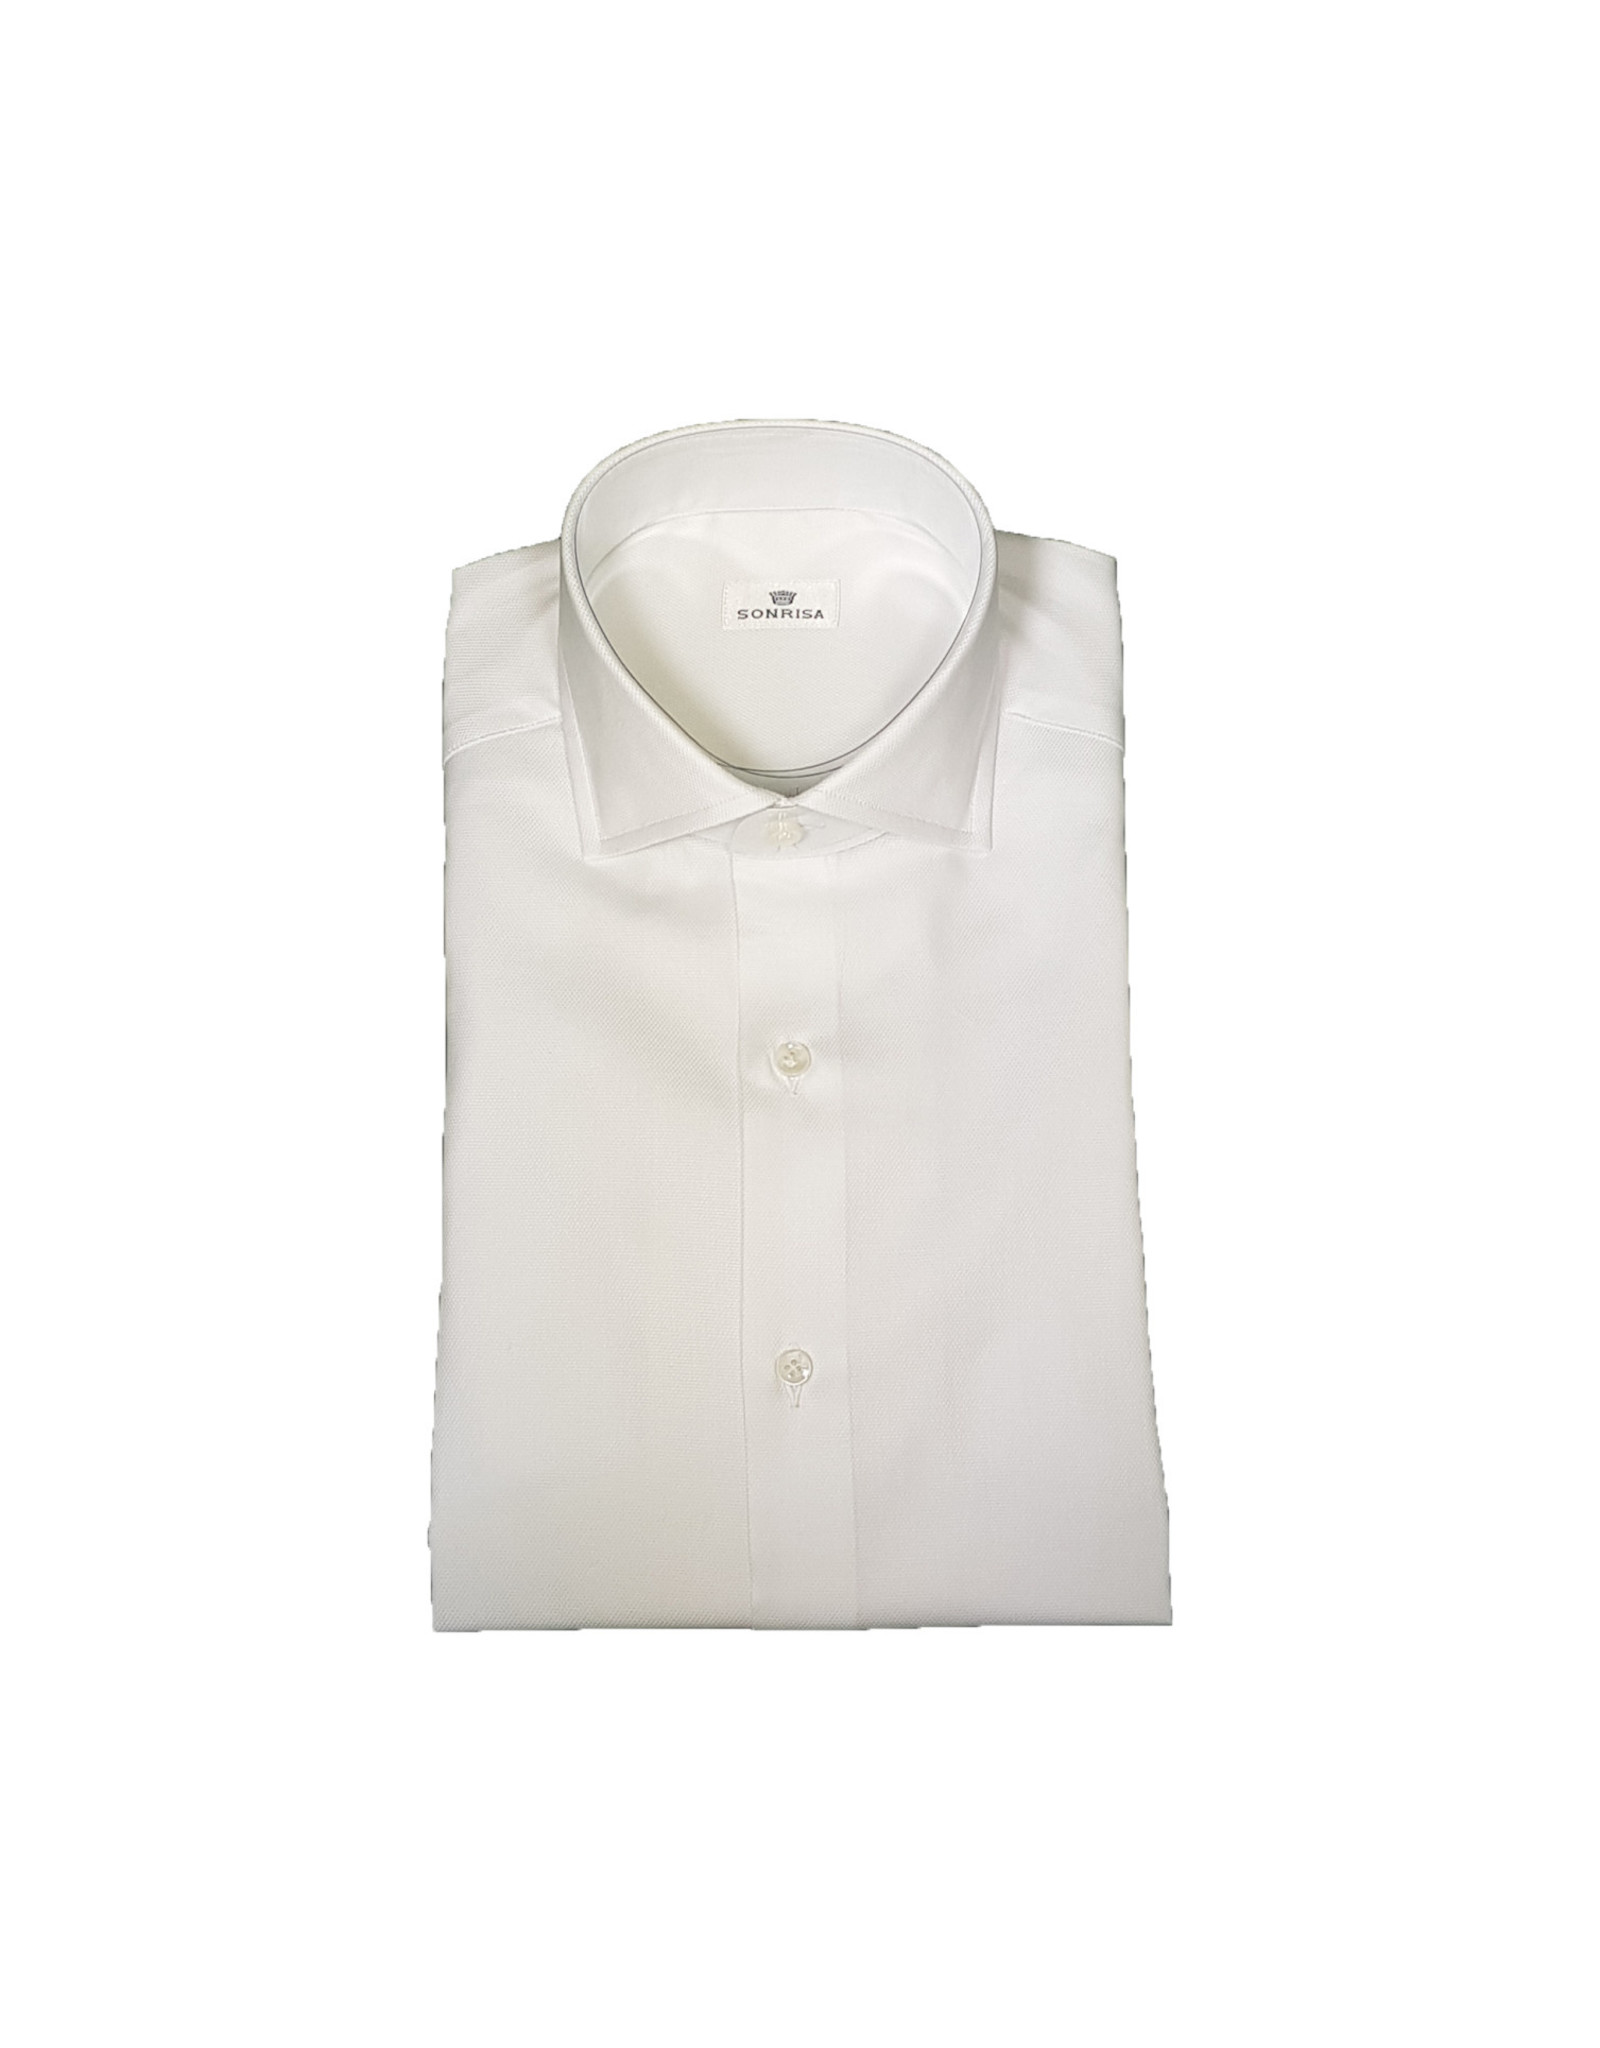 Sonrisa Sonrisa hemd wit Fitted body V3003/01